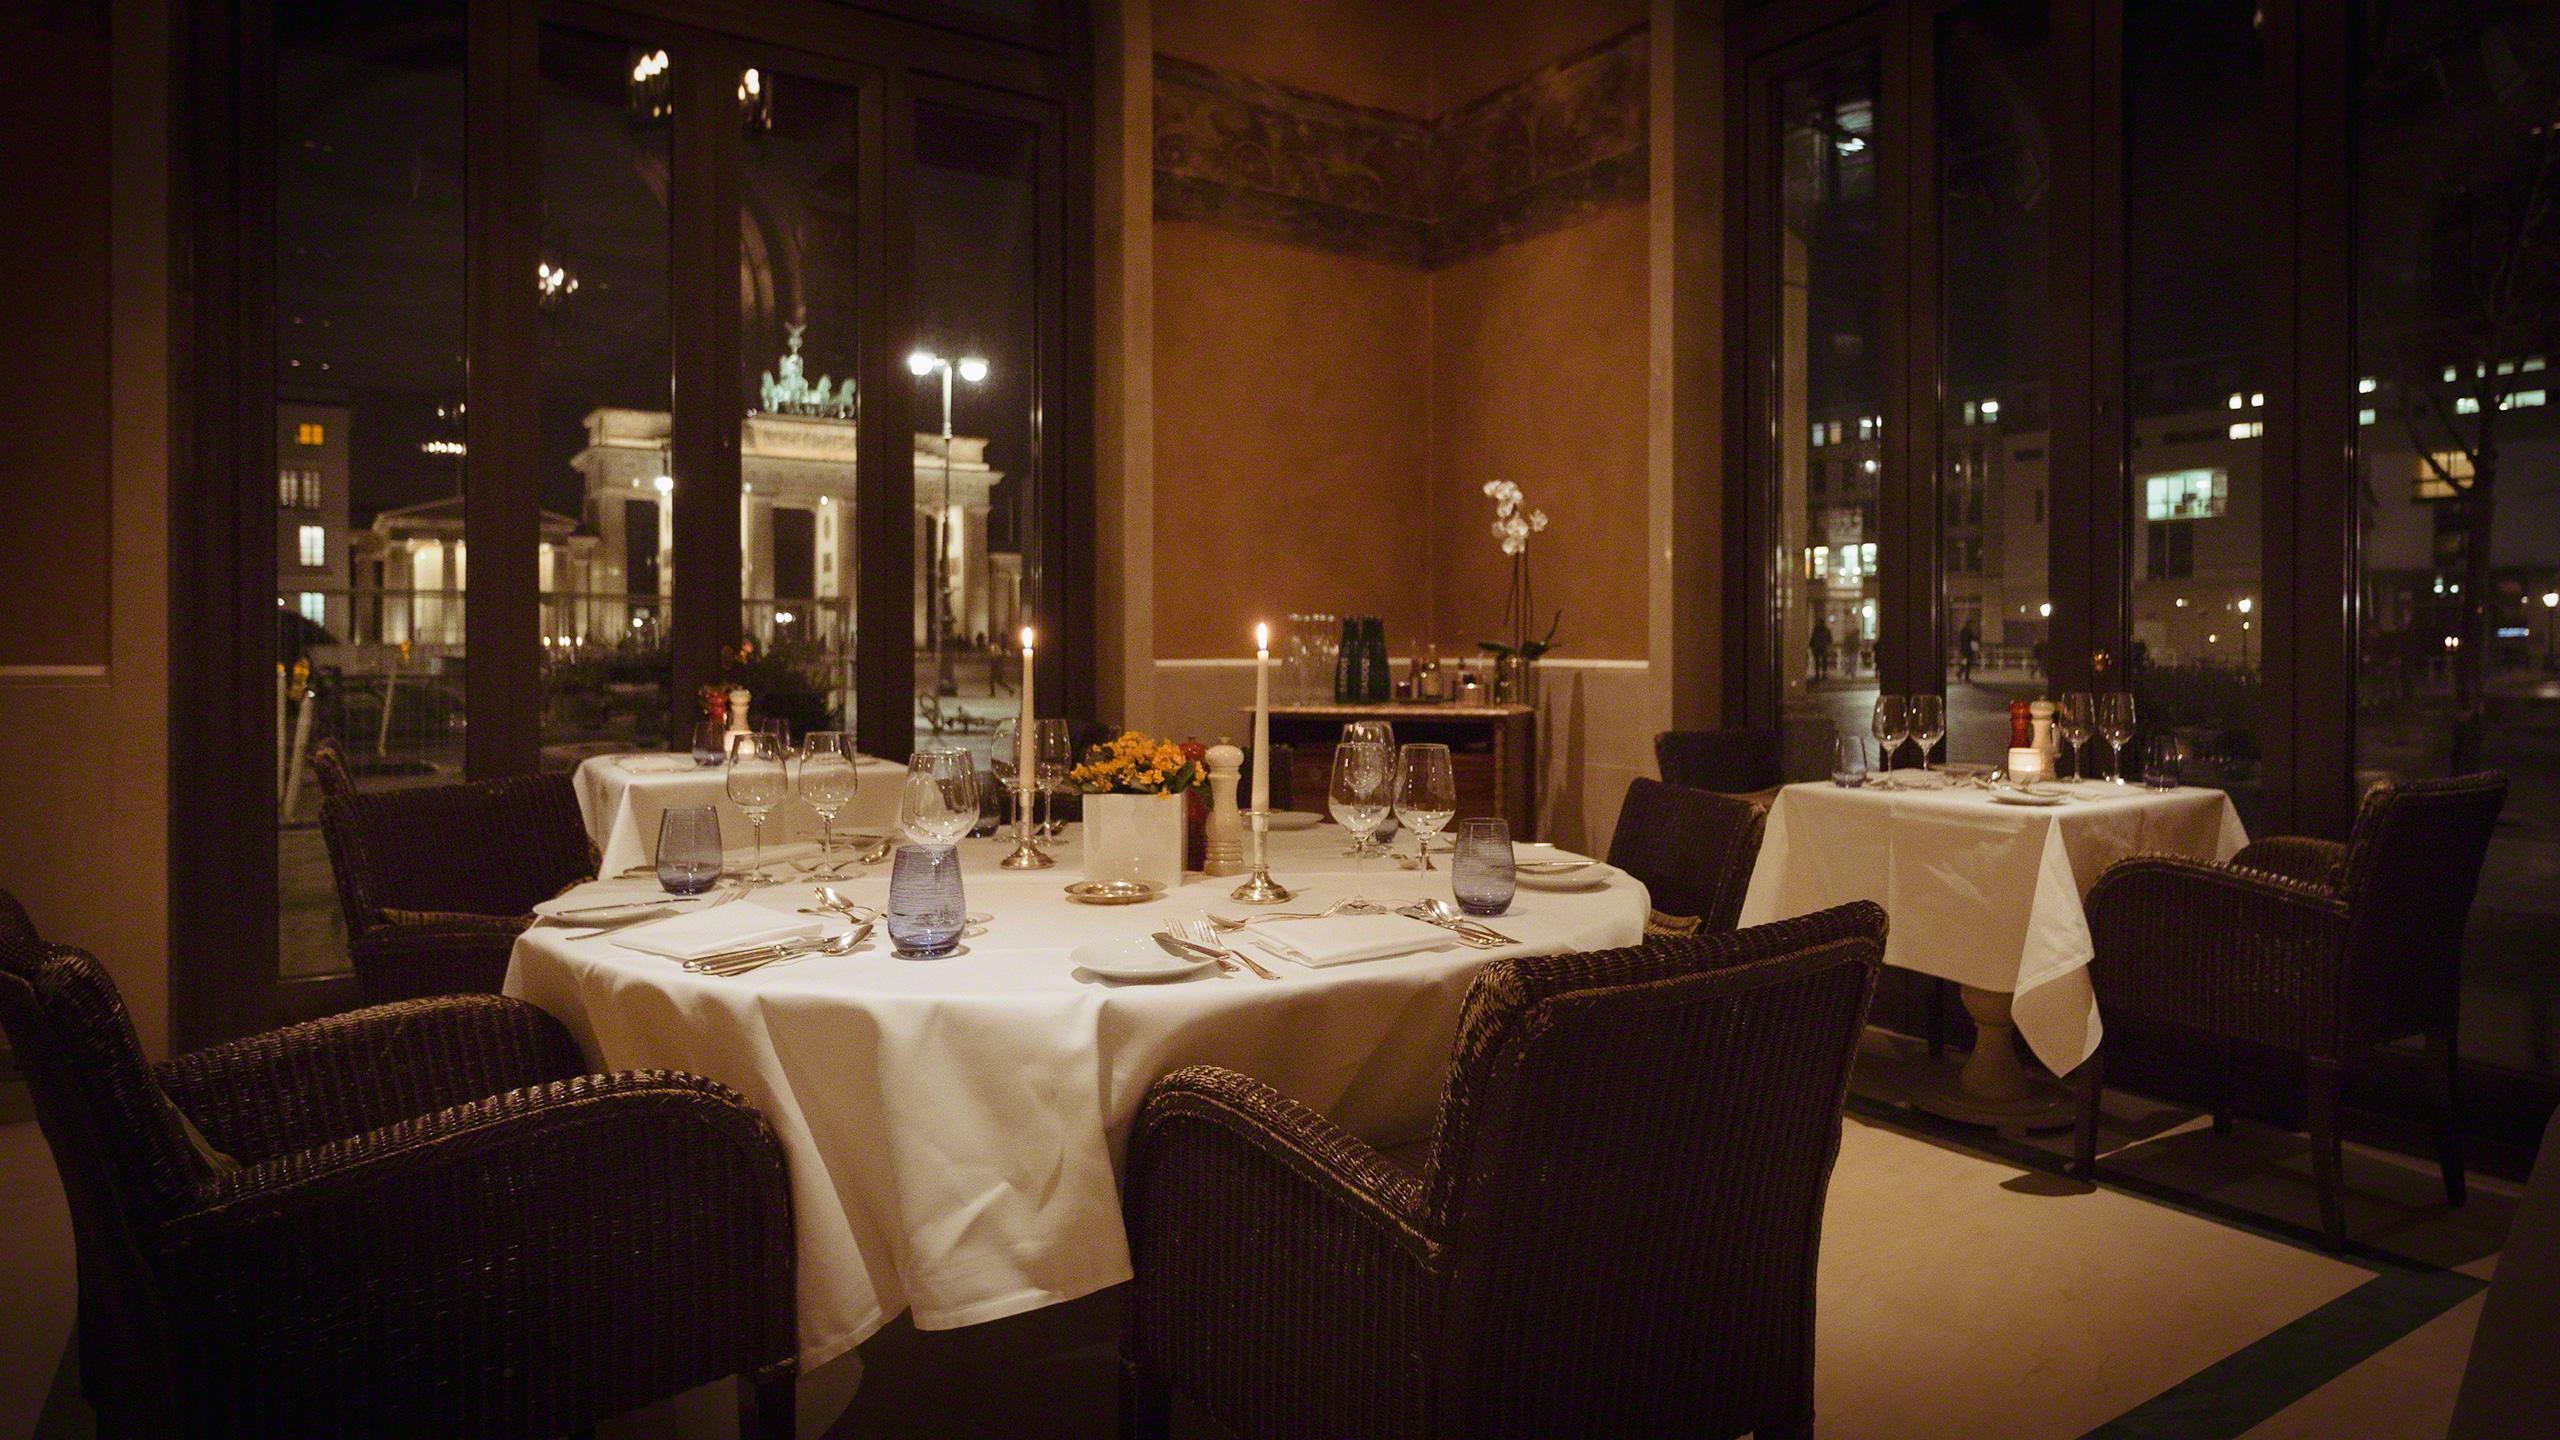 Luxushotel Adon Kempinski Berlin Restaurant Quaree